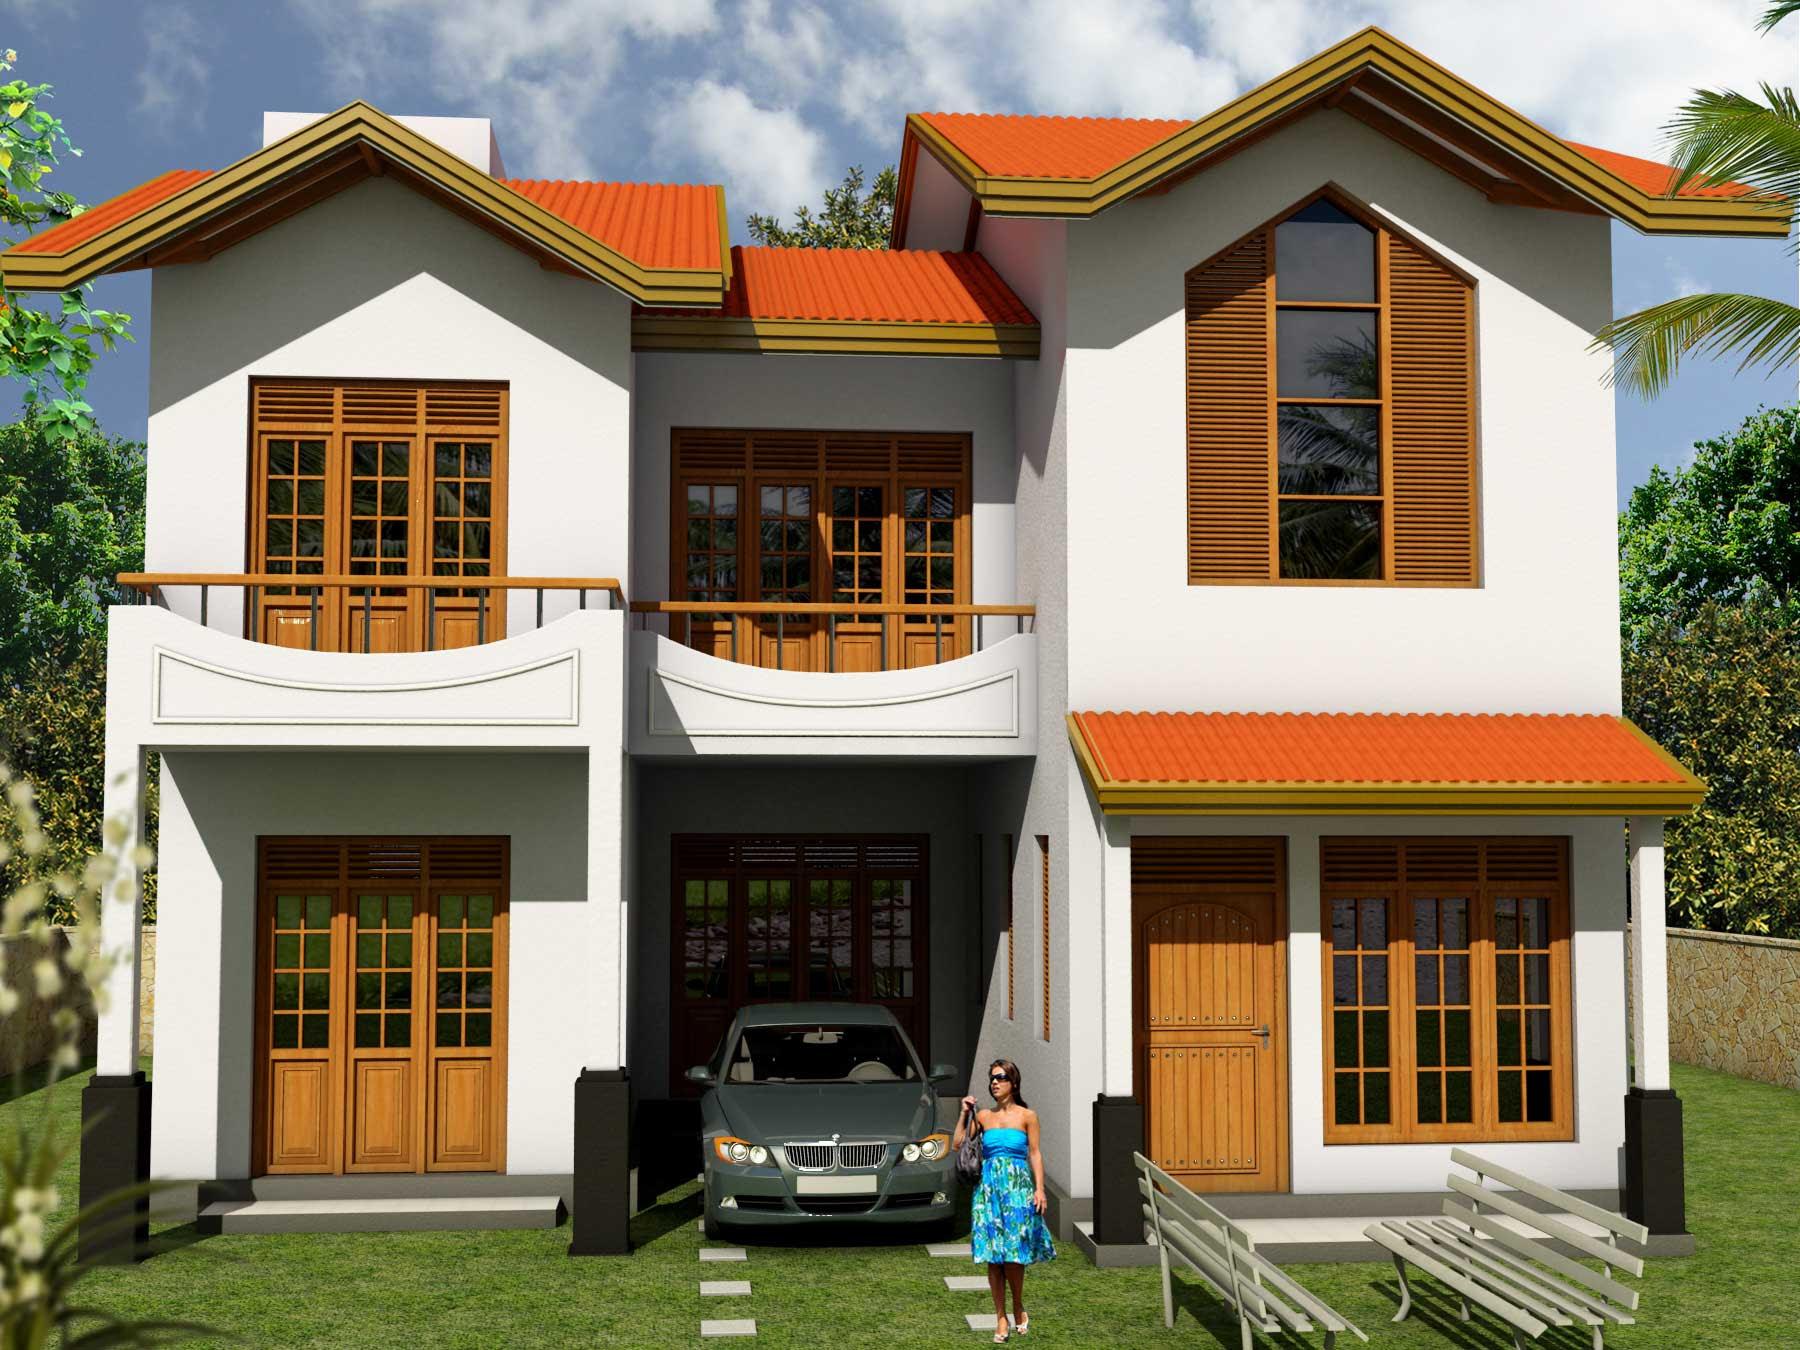 House Plans and Design: Modern House Plans Sri Lanka - Sri Lanka Home Photos